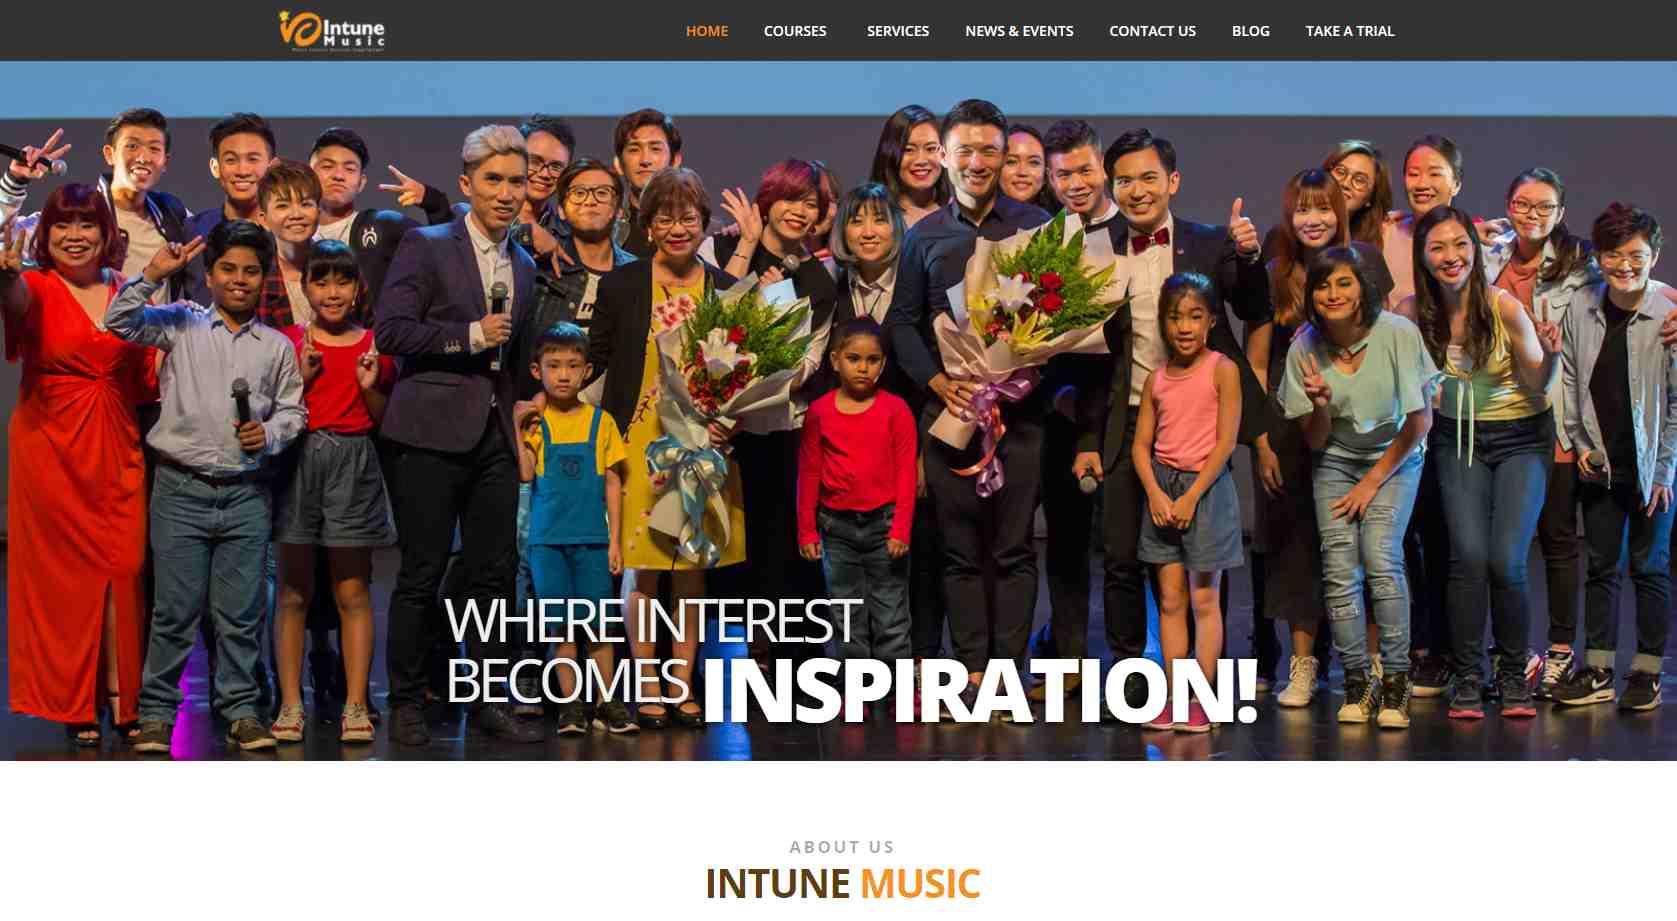 intune music Top Music Schools in Singapore